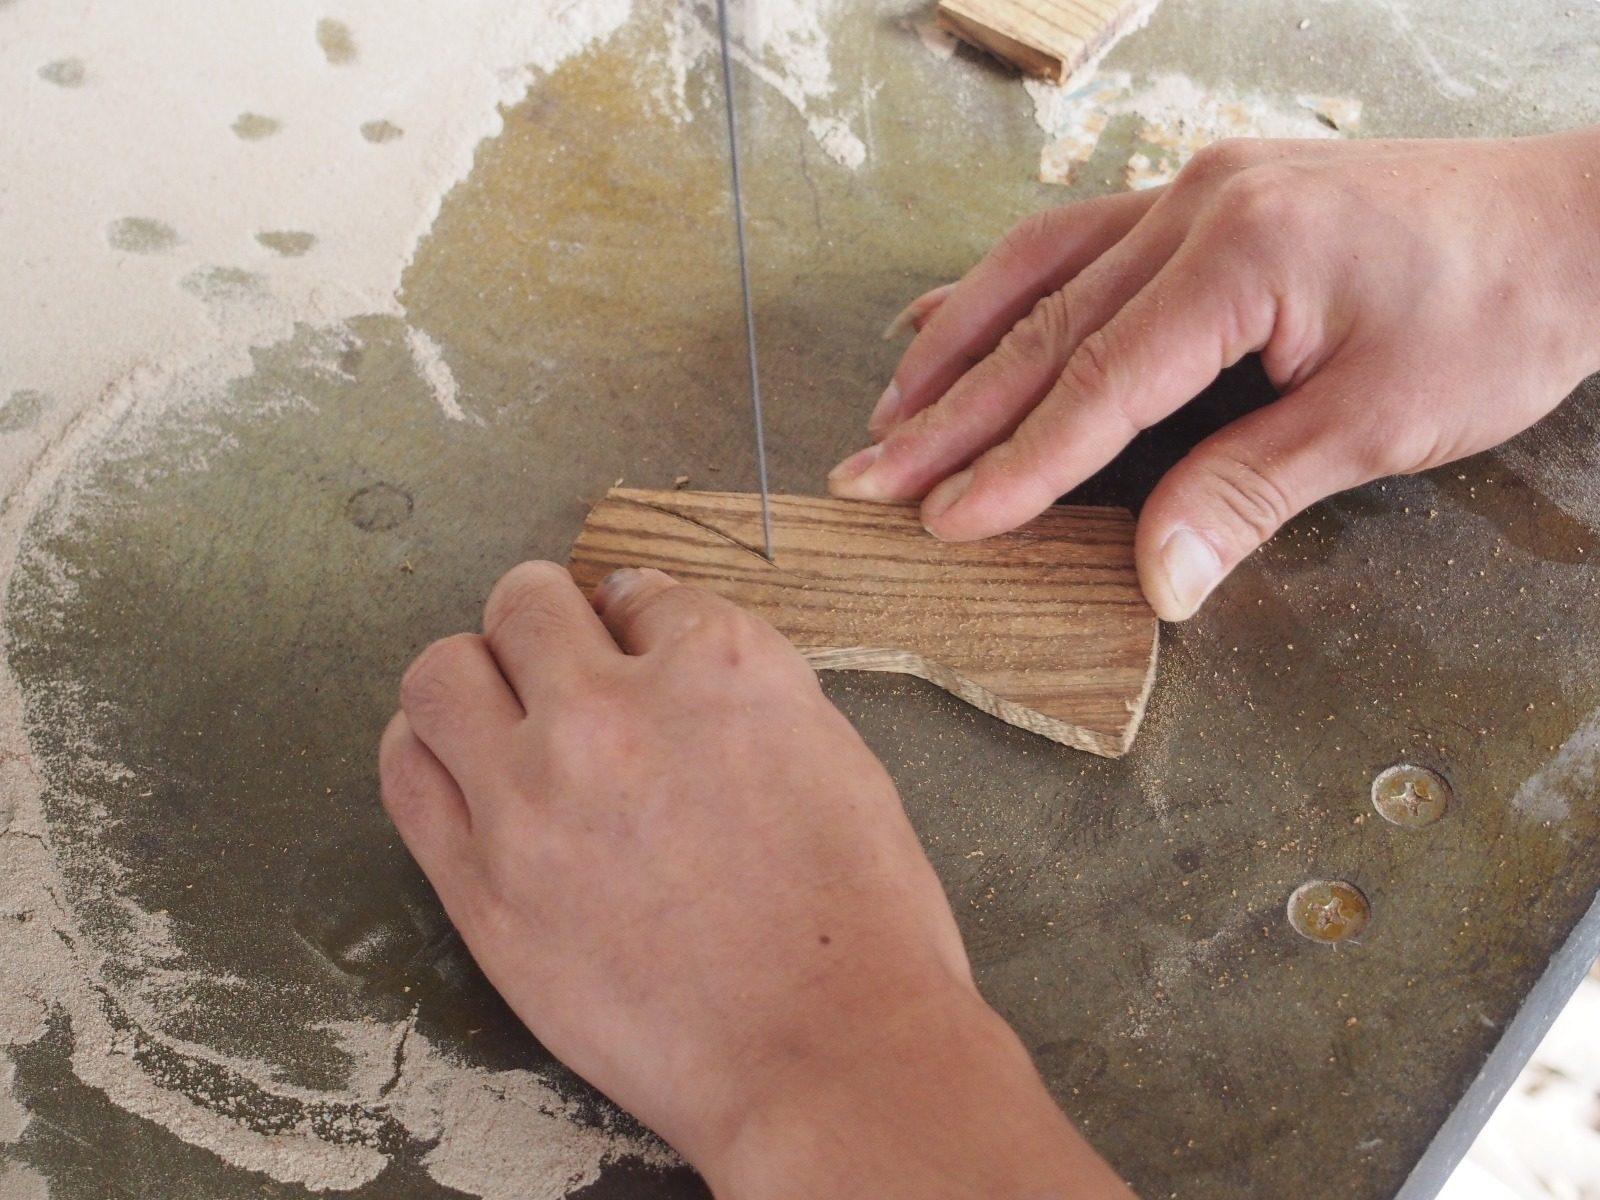 fabrication noeuds papillon Sisswy bois wavre brabant mode tendance mariage